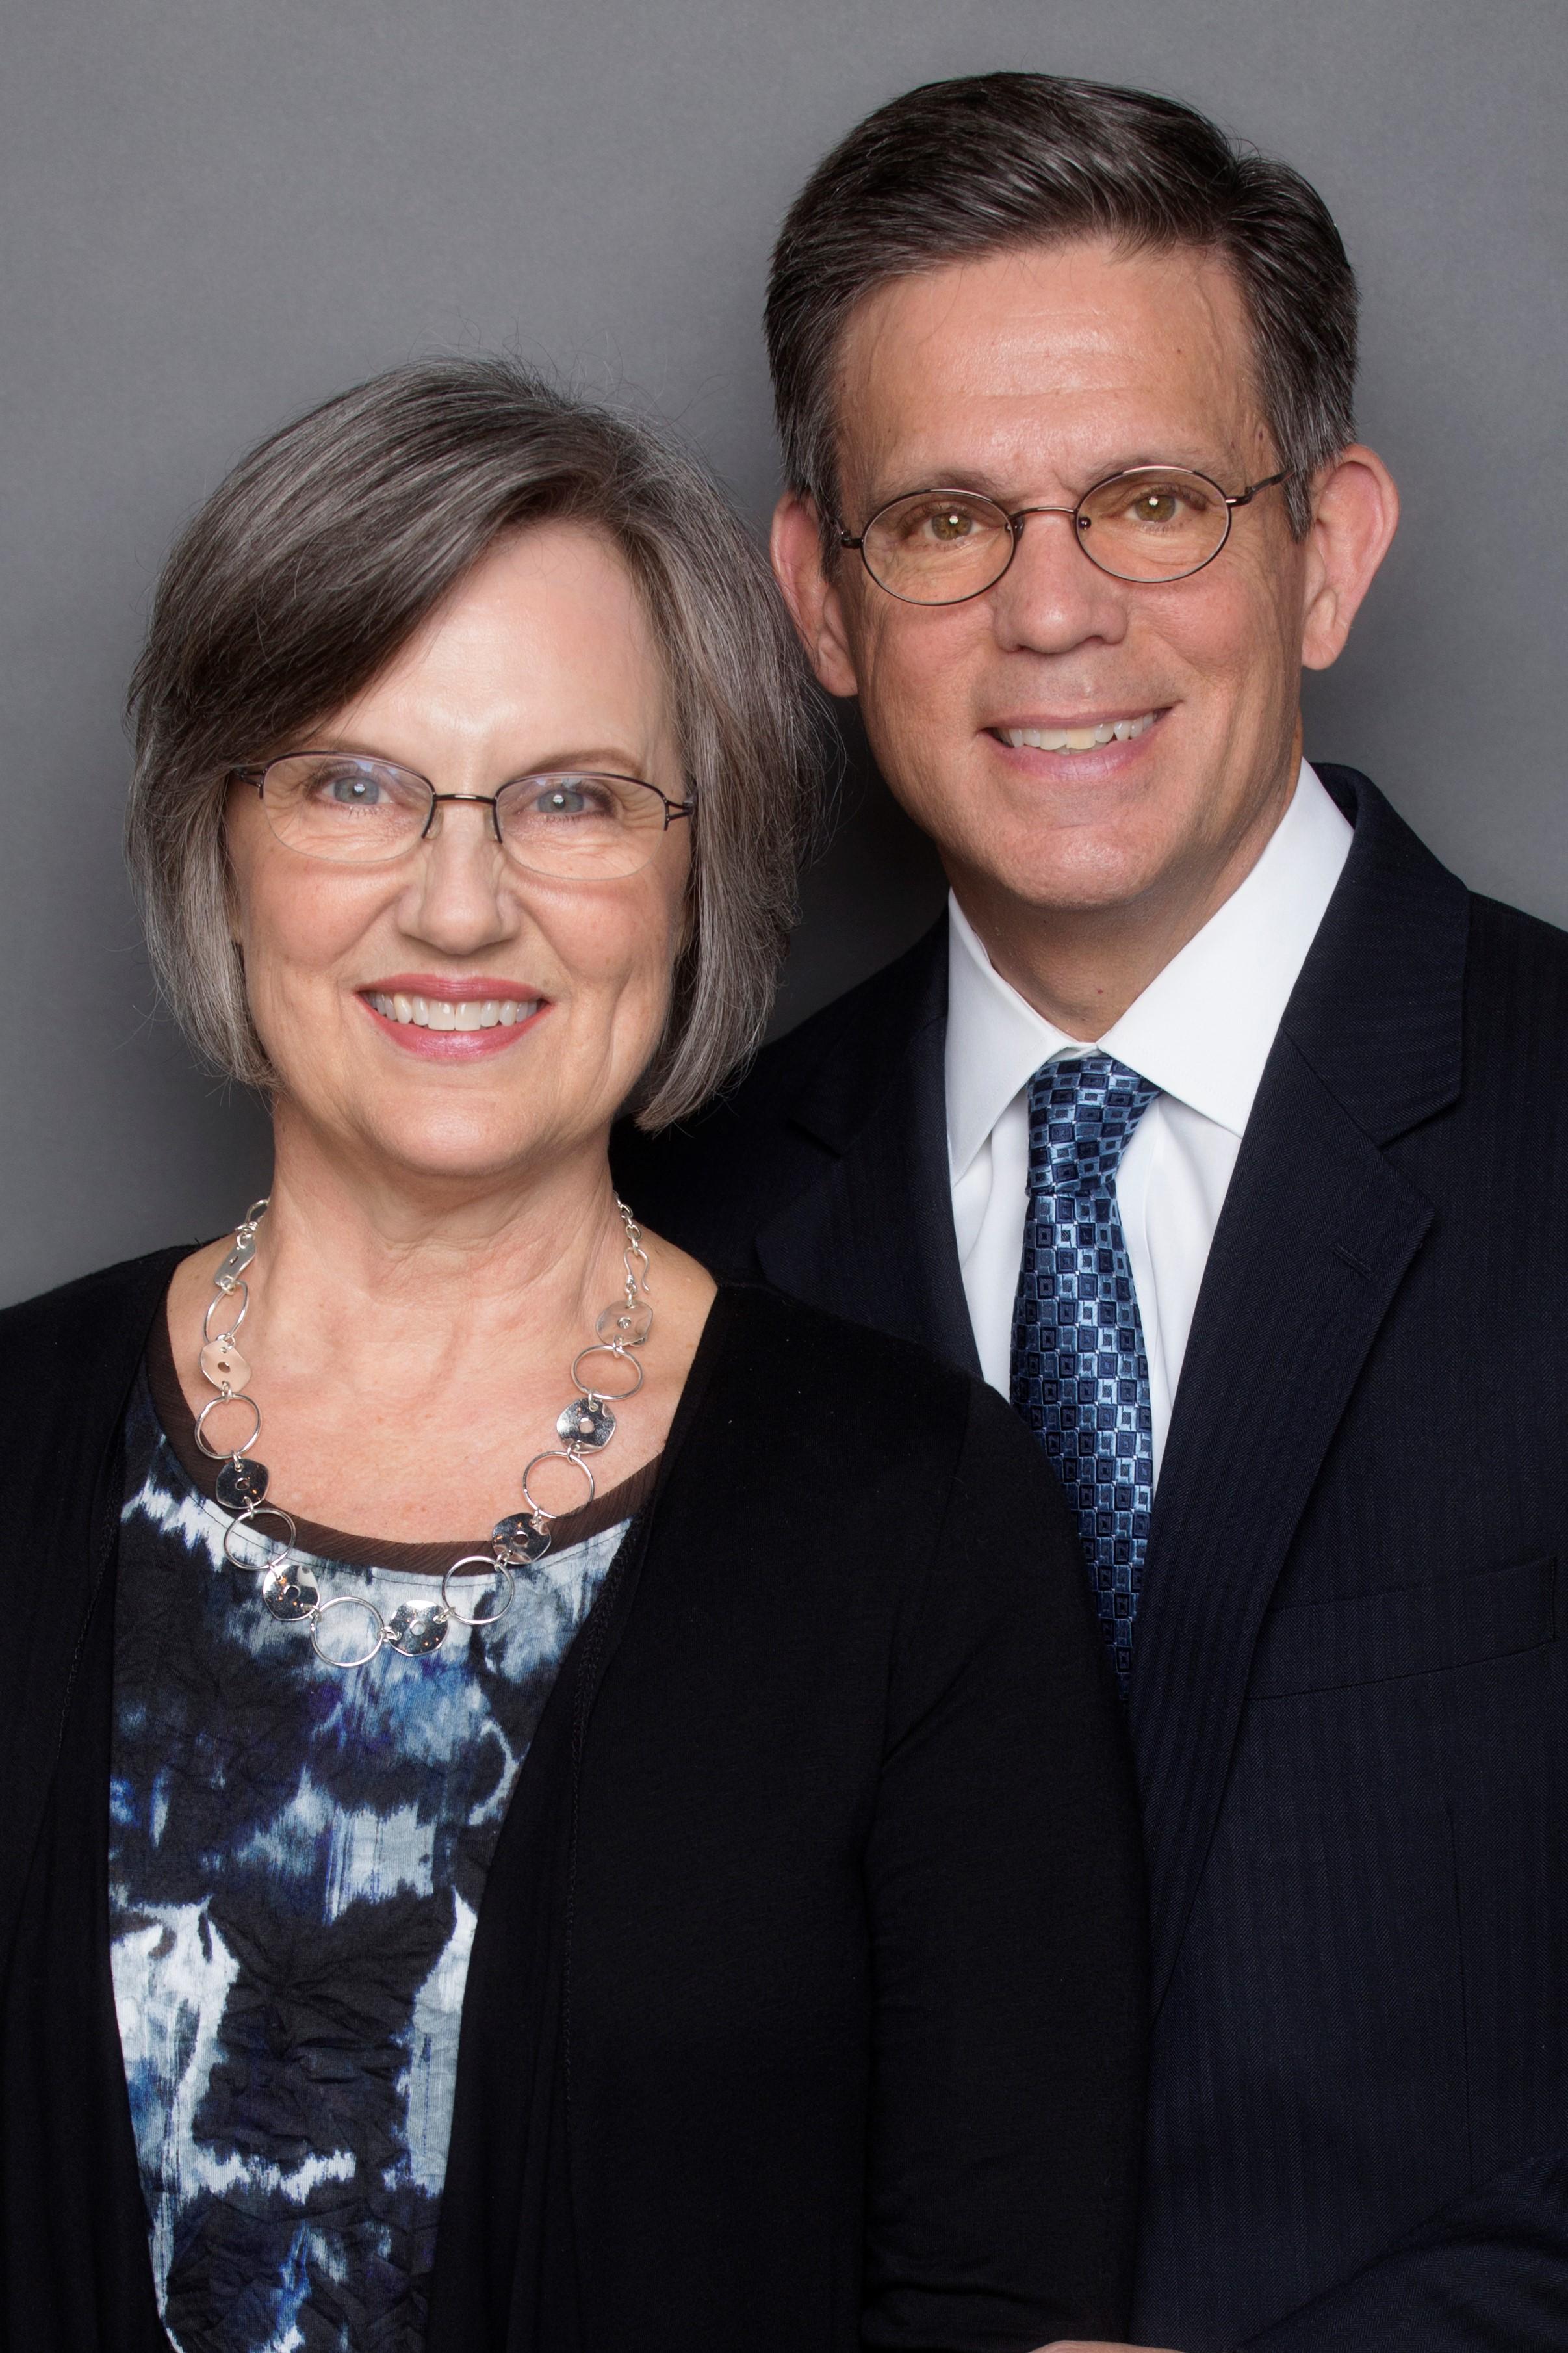 Leslie Niven and Milan Foster Kunz